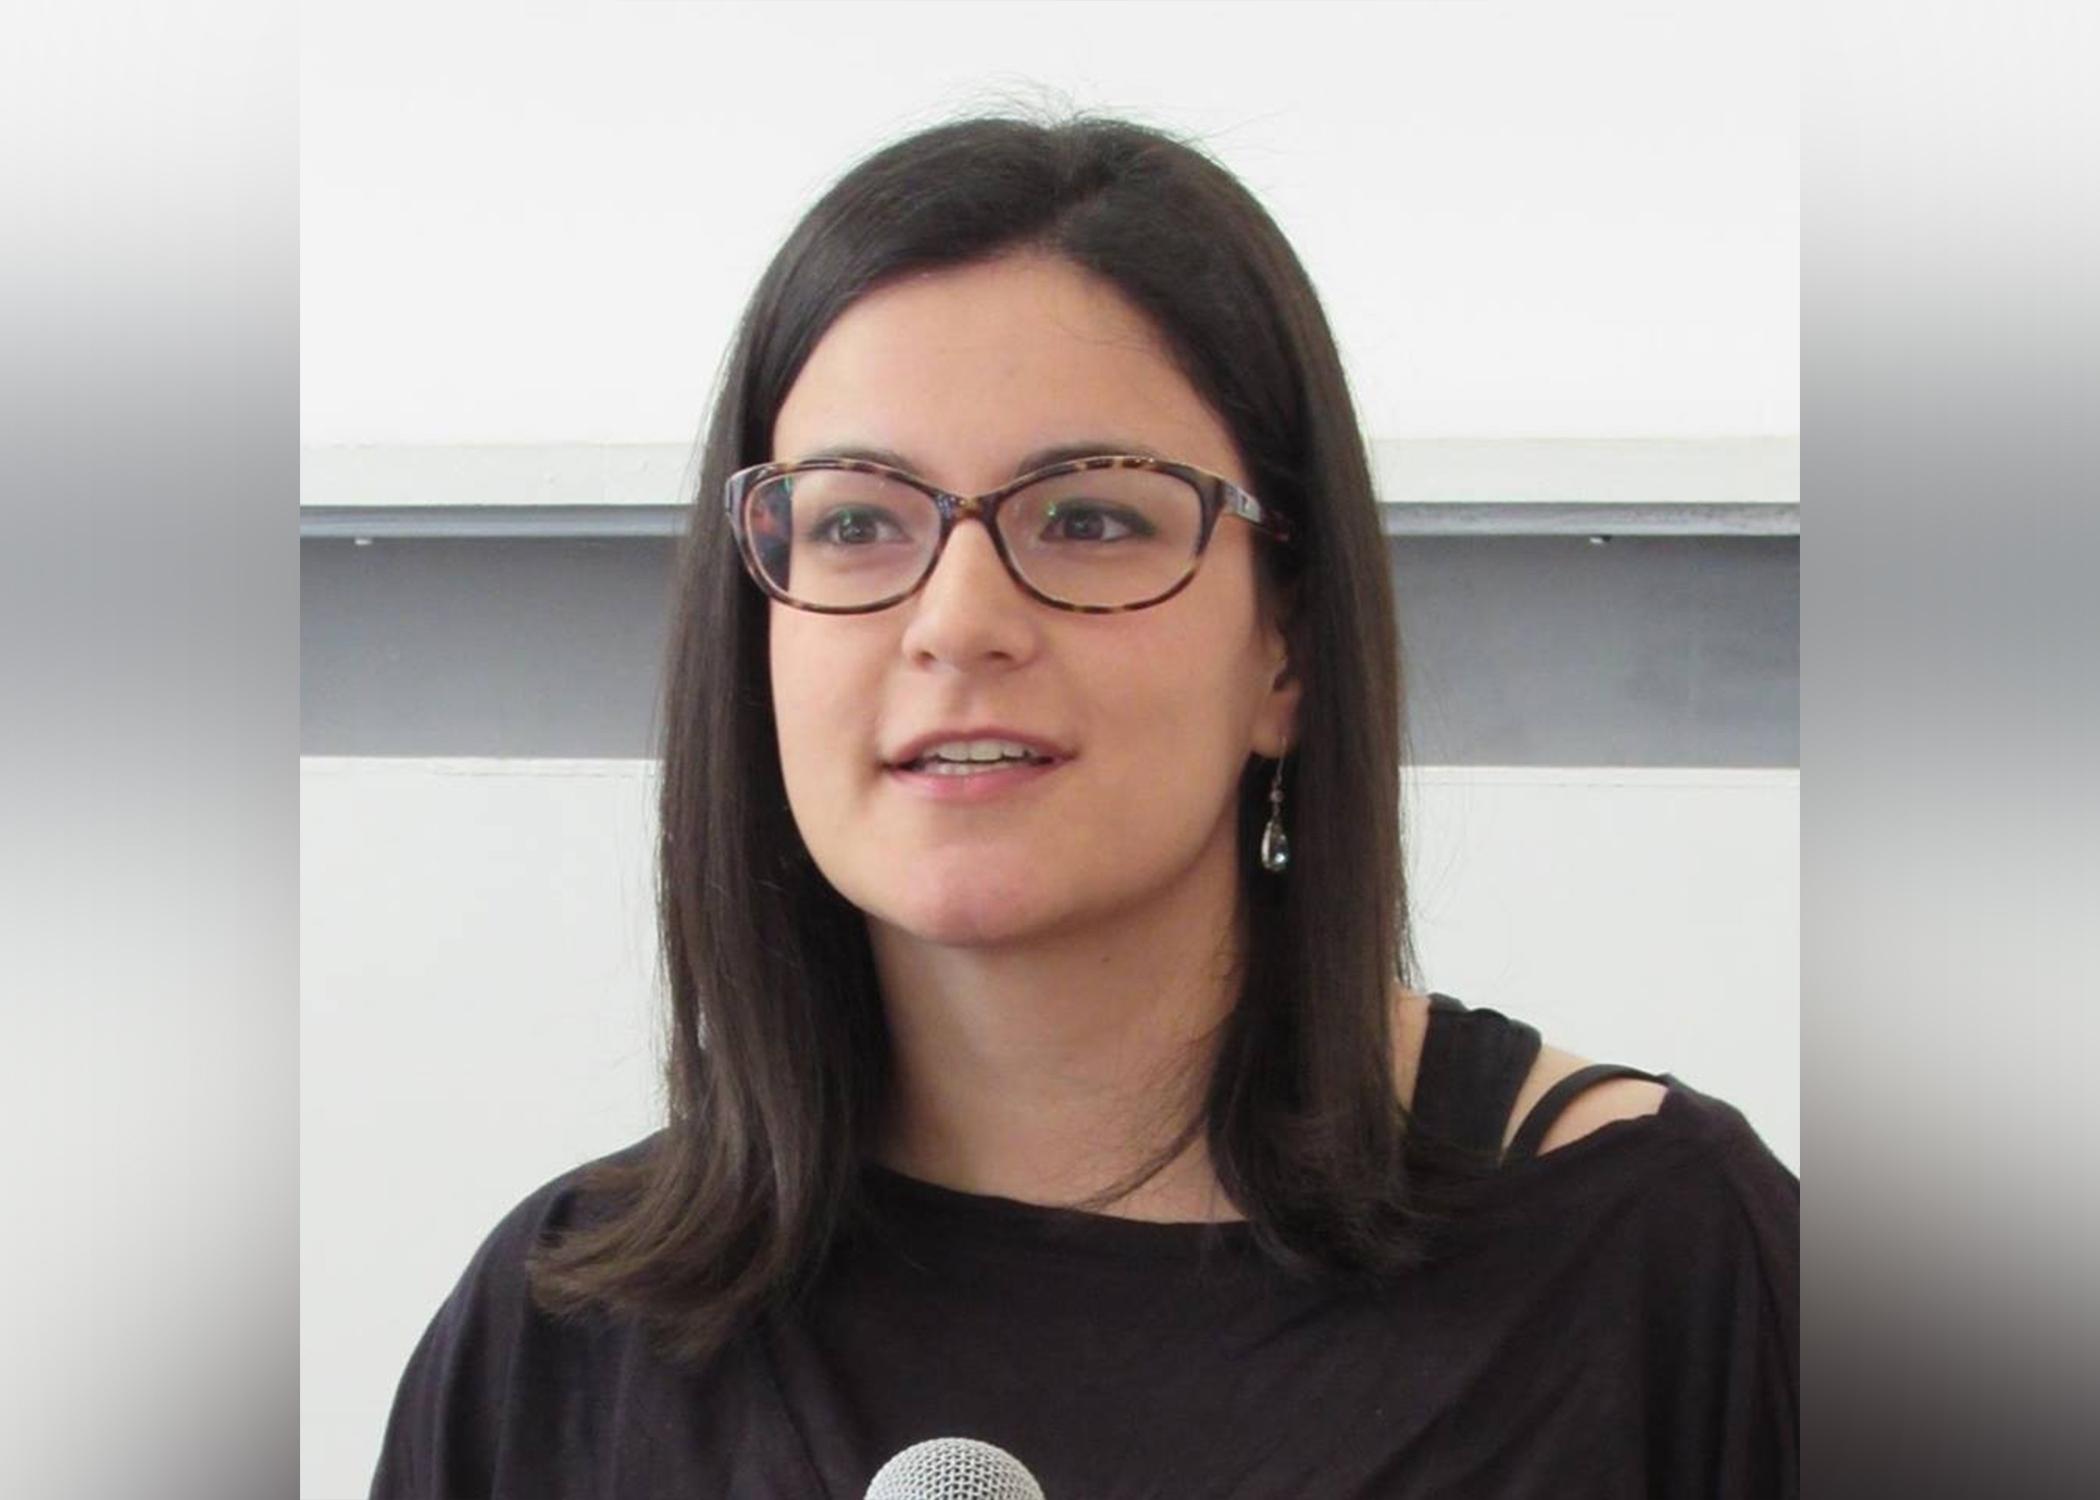 Smiljana Josic